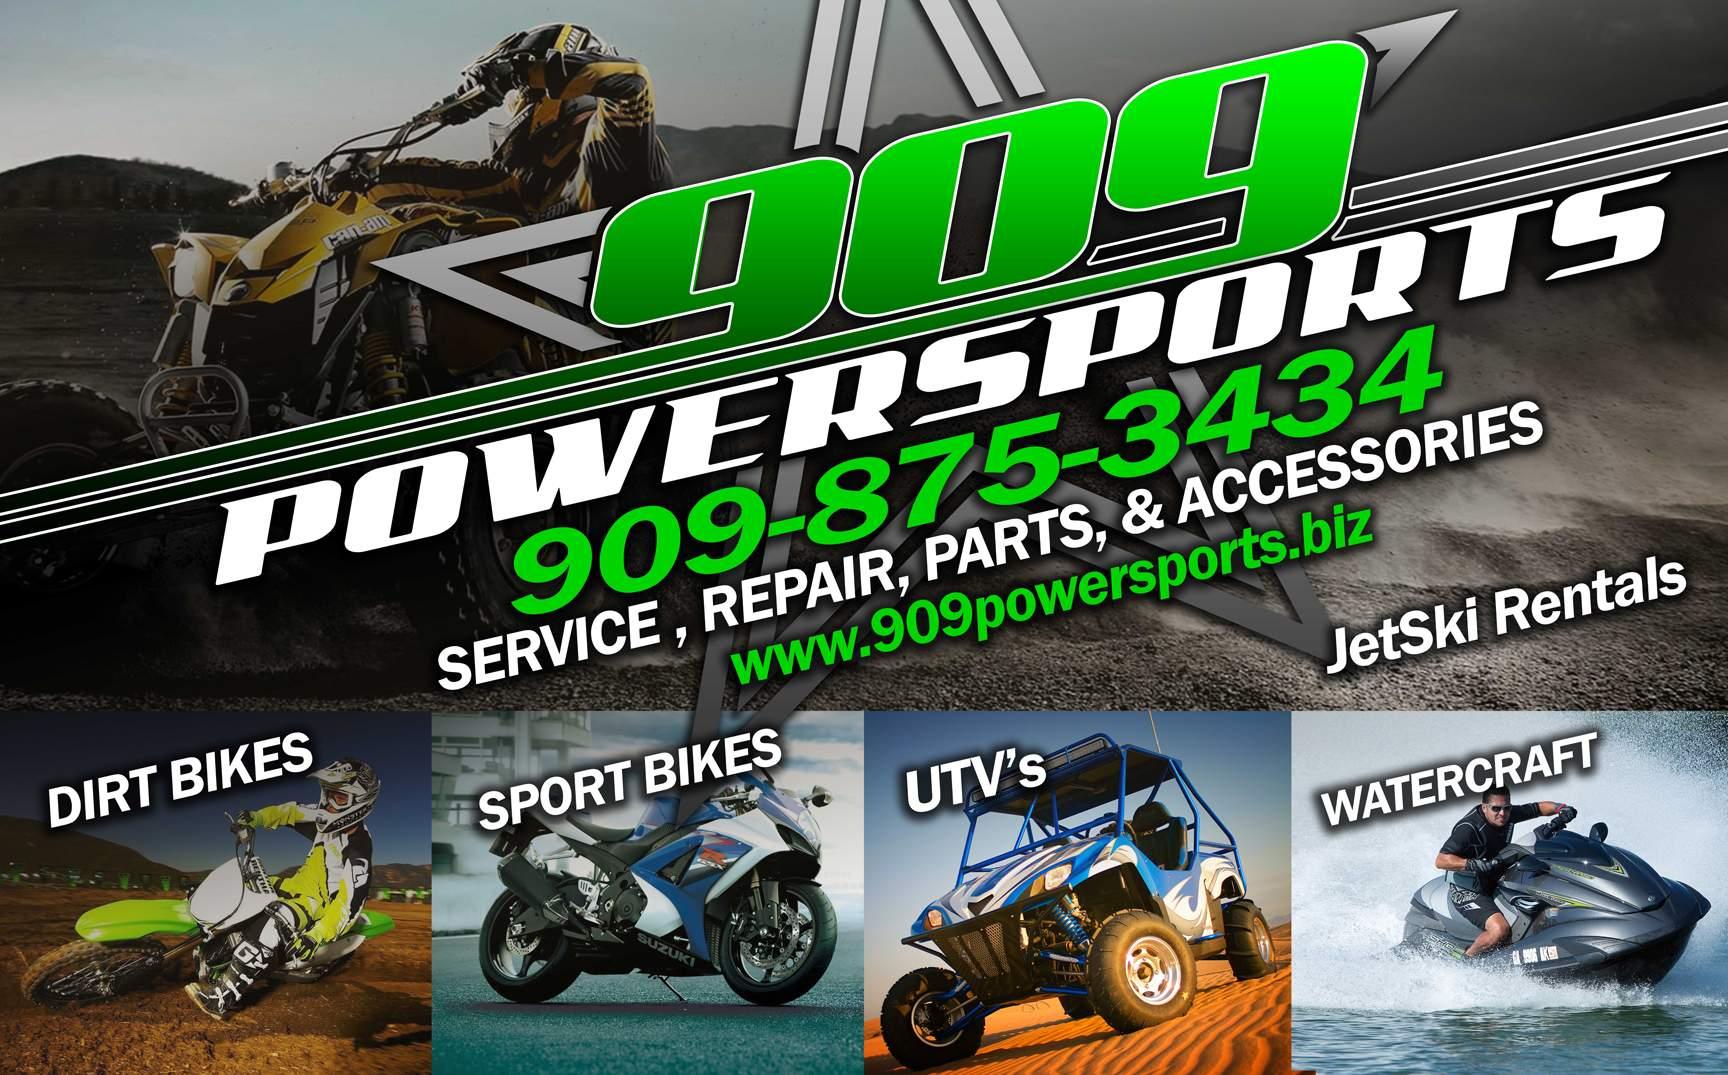 New 2016 Kandi 200cc Go-Kart ATVs For Sale in California on atvtrades com